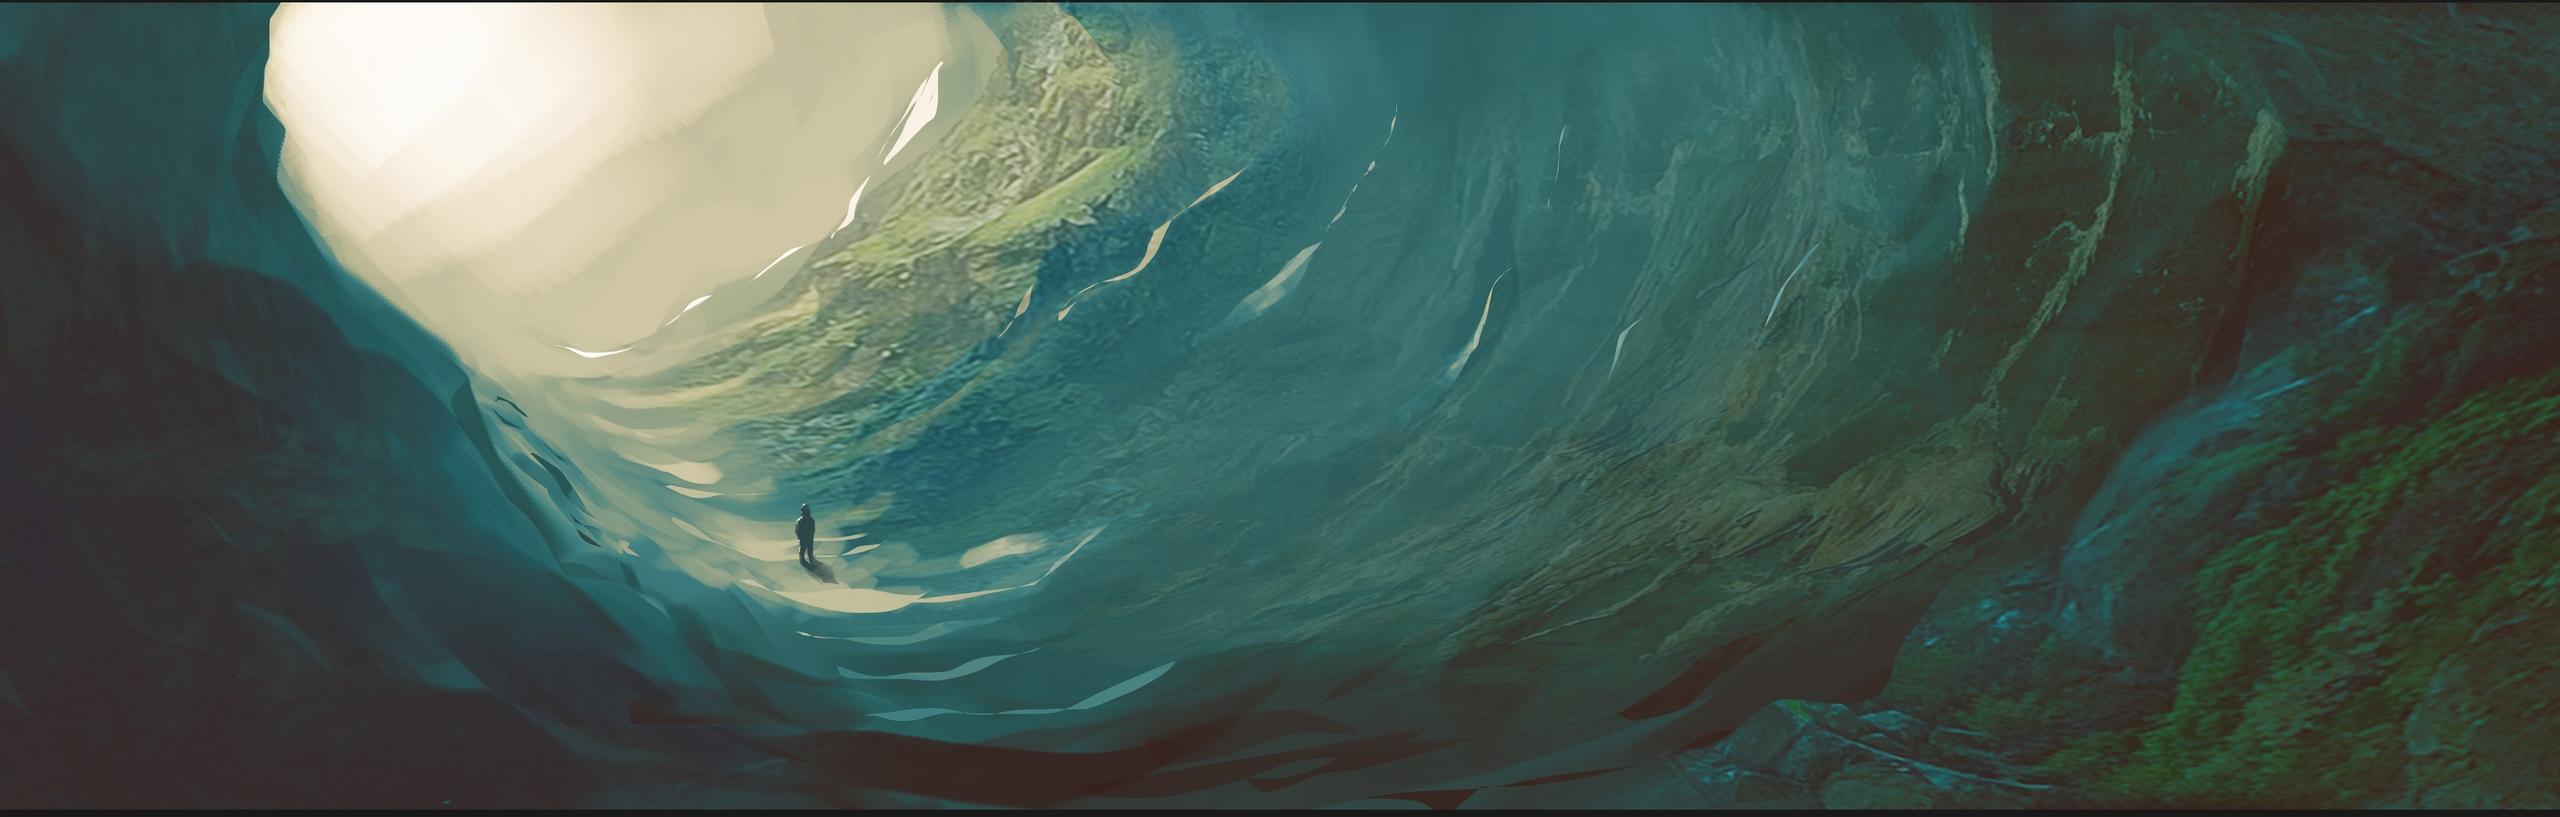 Cave landscape practice - illustration - bassim | ello